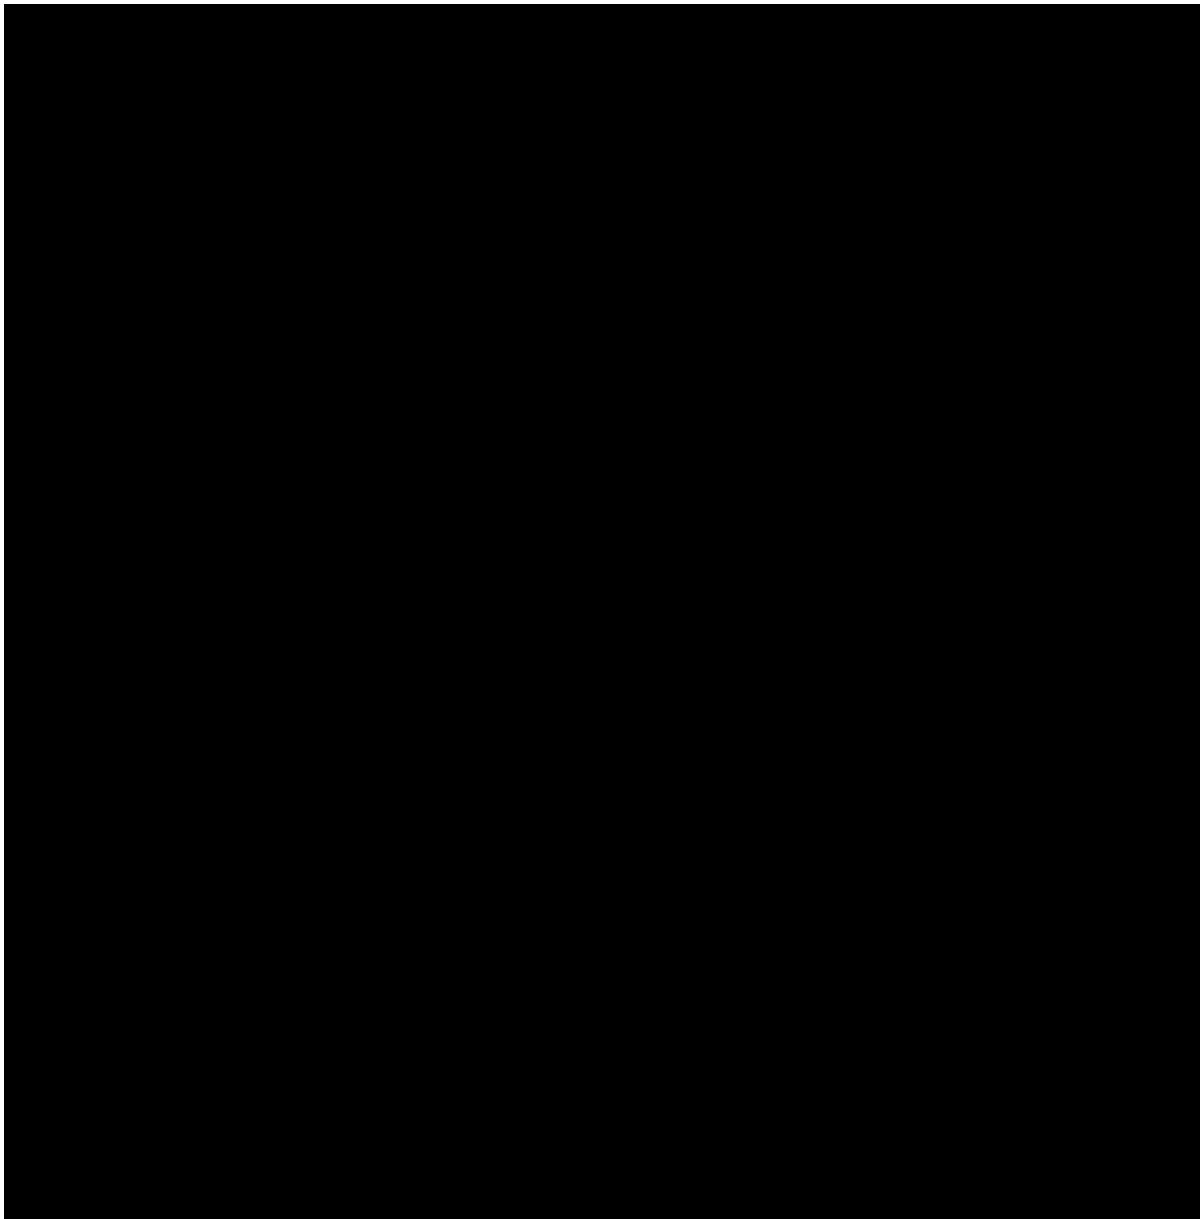 Bleach 562 - Rukia Kuchiki - Lineart by ZeTsu-c